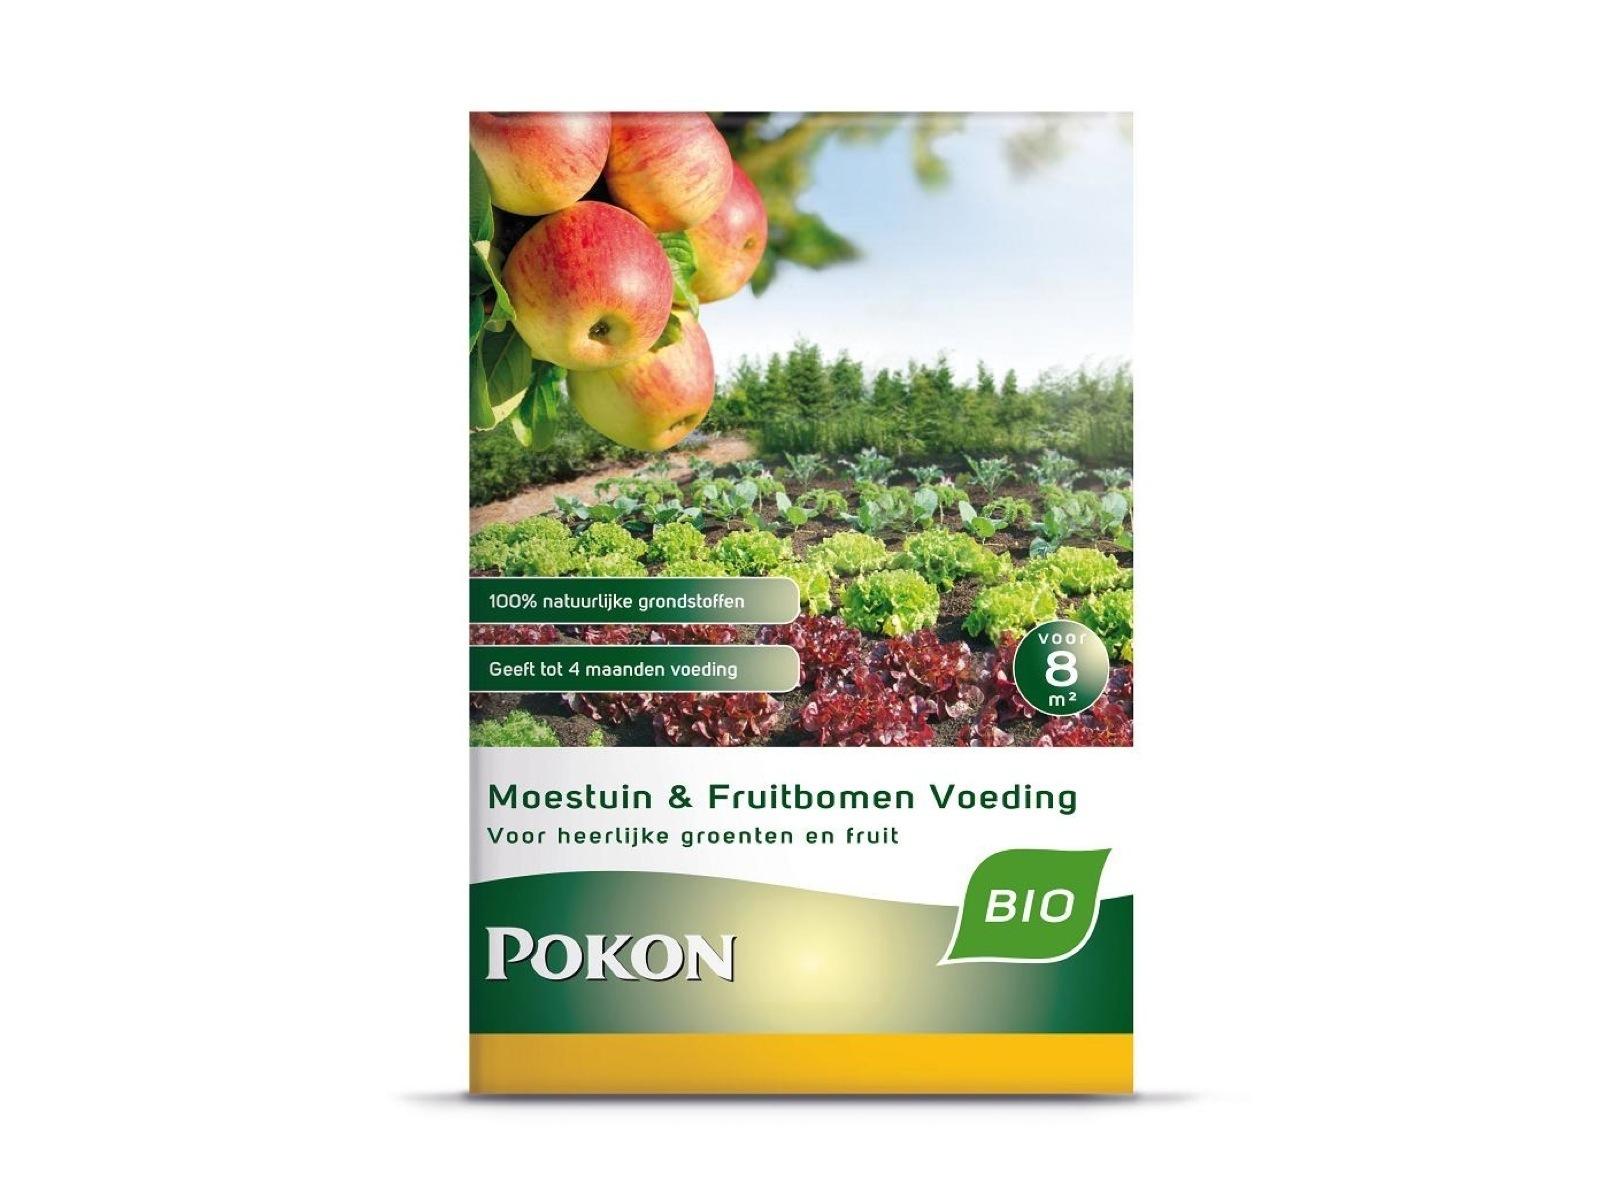 Pok Moestuin & Fruitbomen voeding 800g Bio